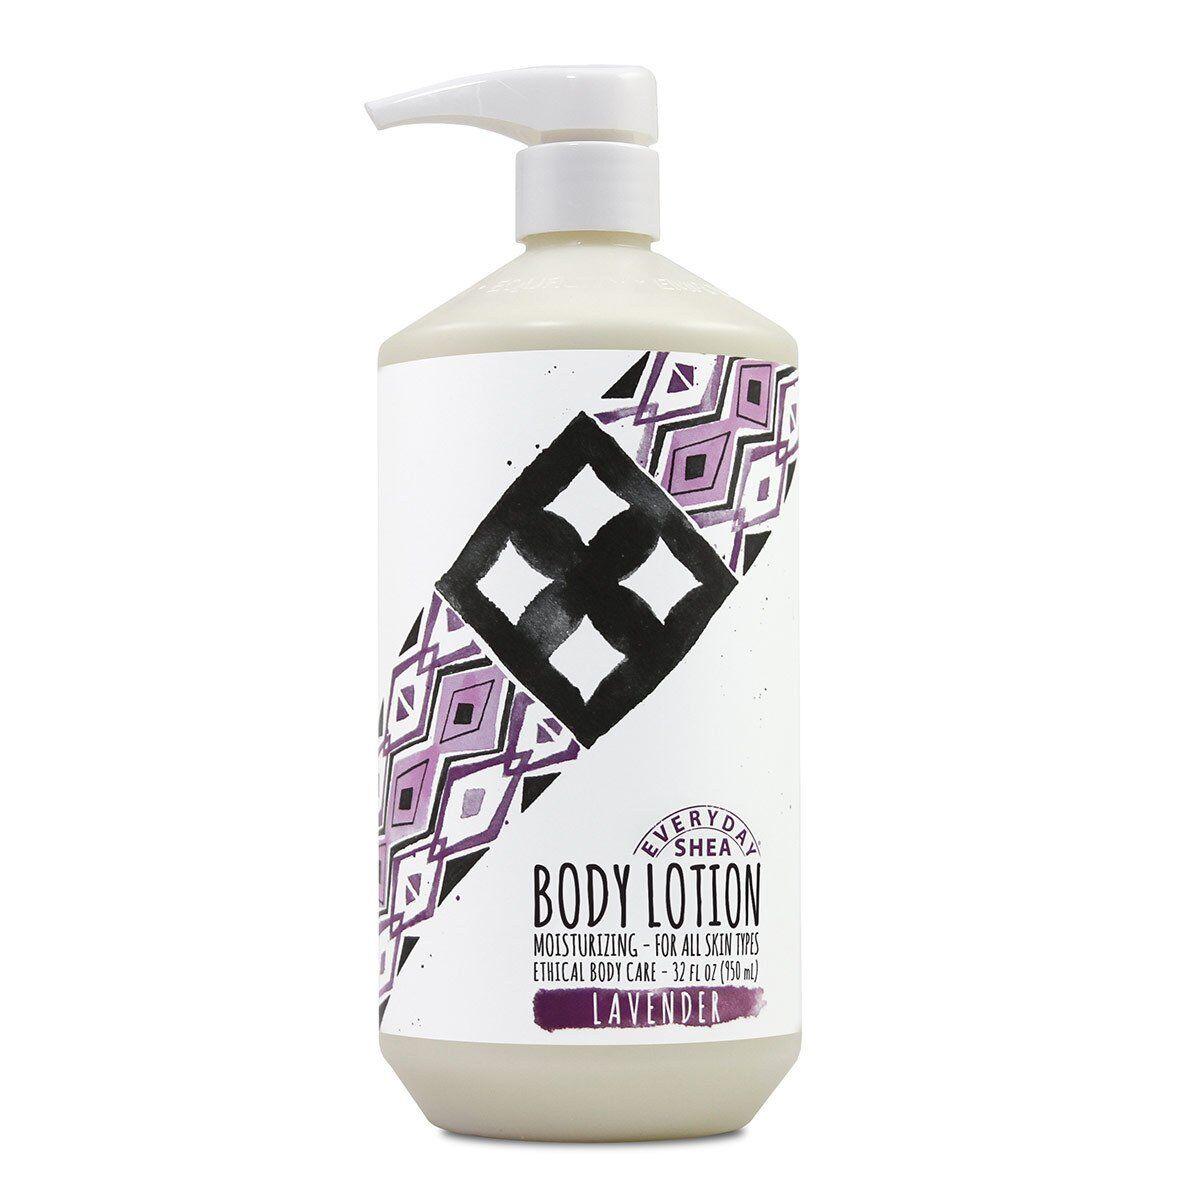 Alaffia - Everyday Shea Moisturizing Body Lotion - Lavender